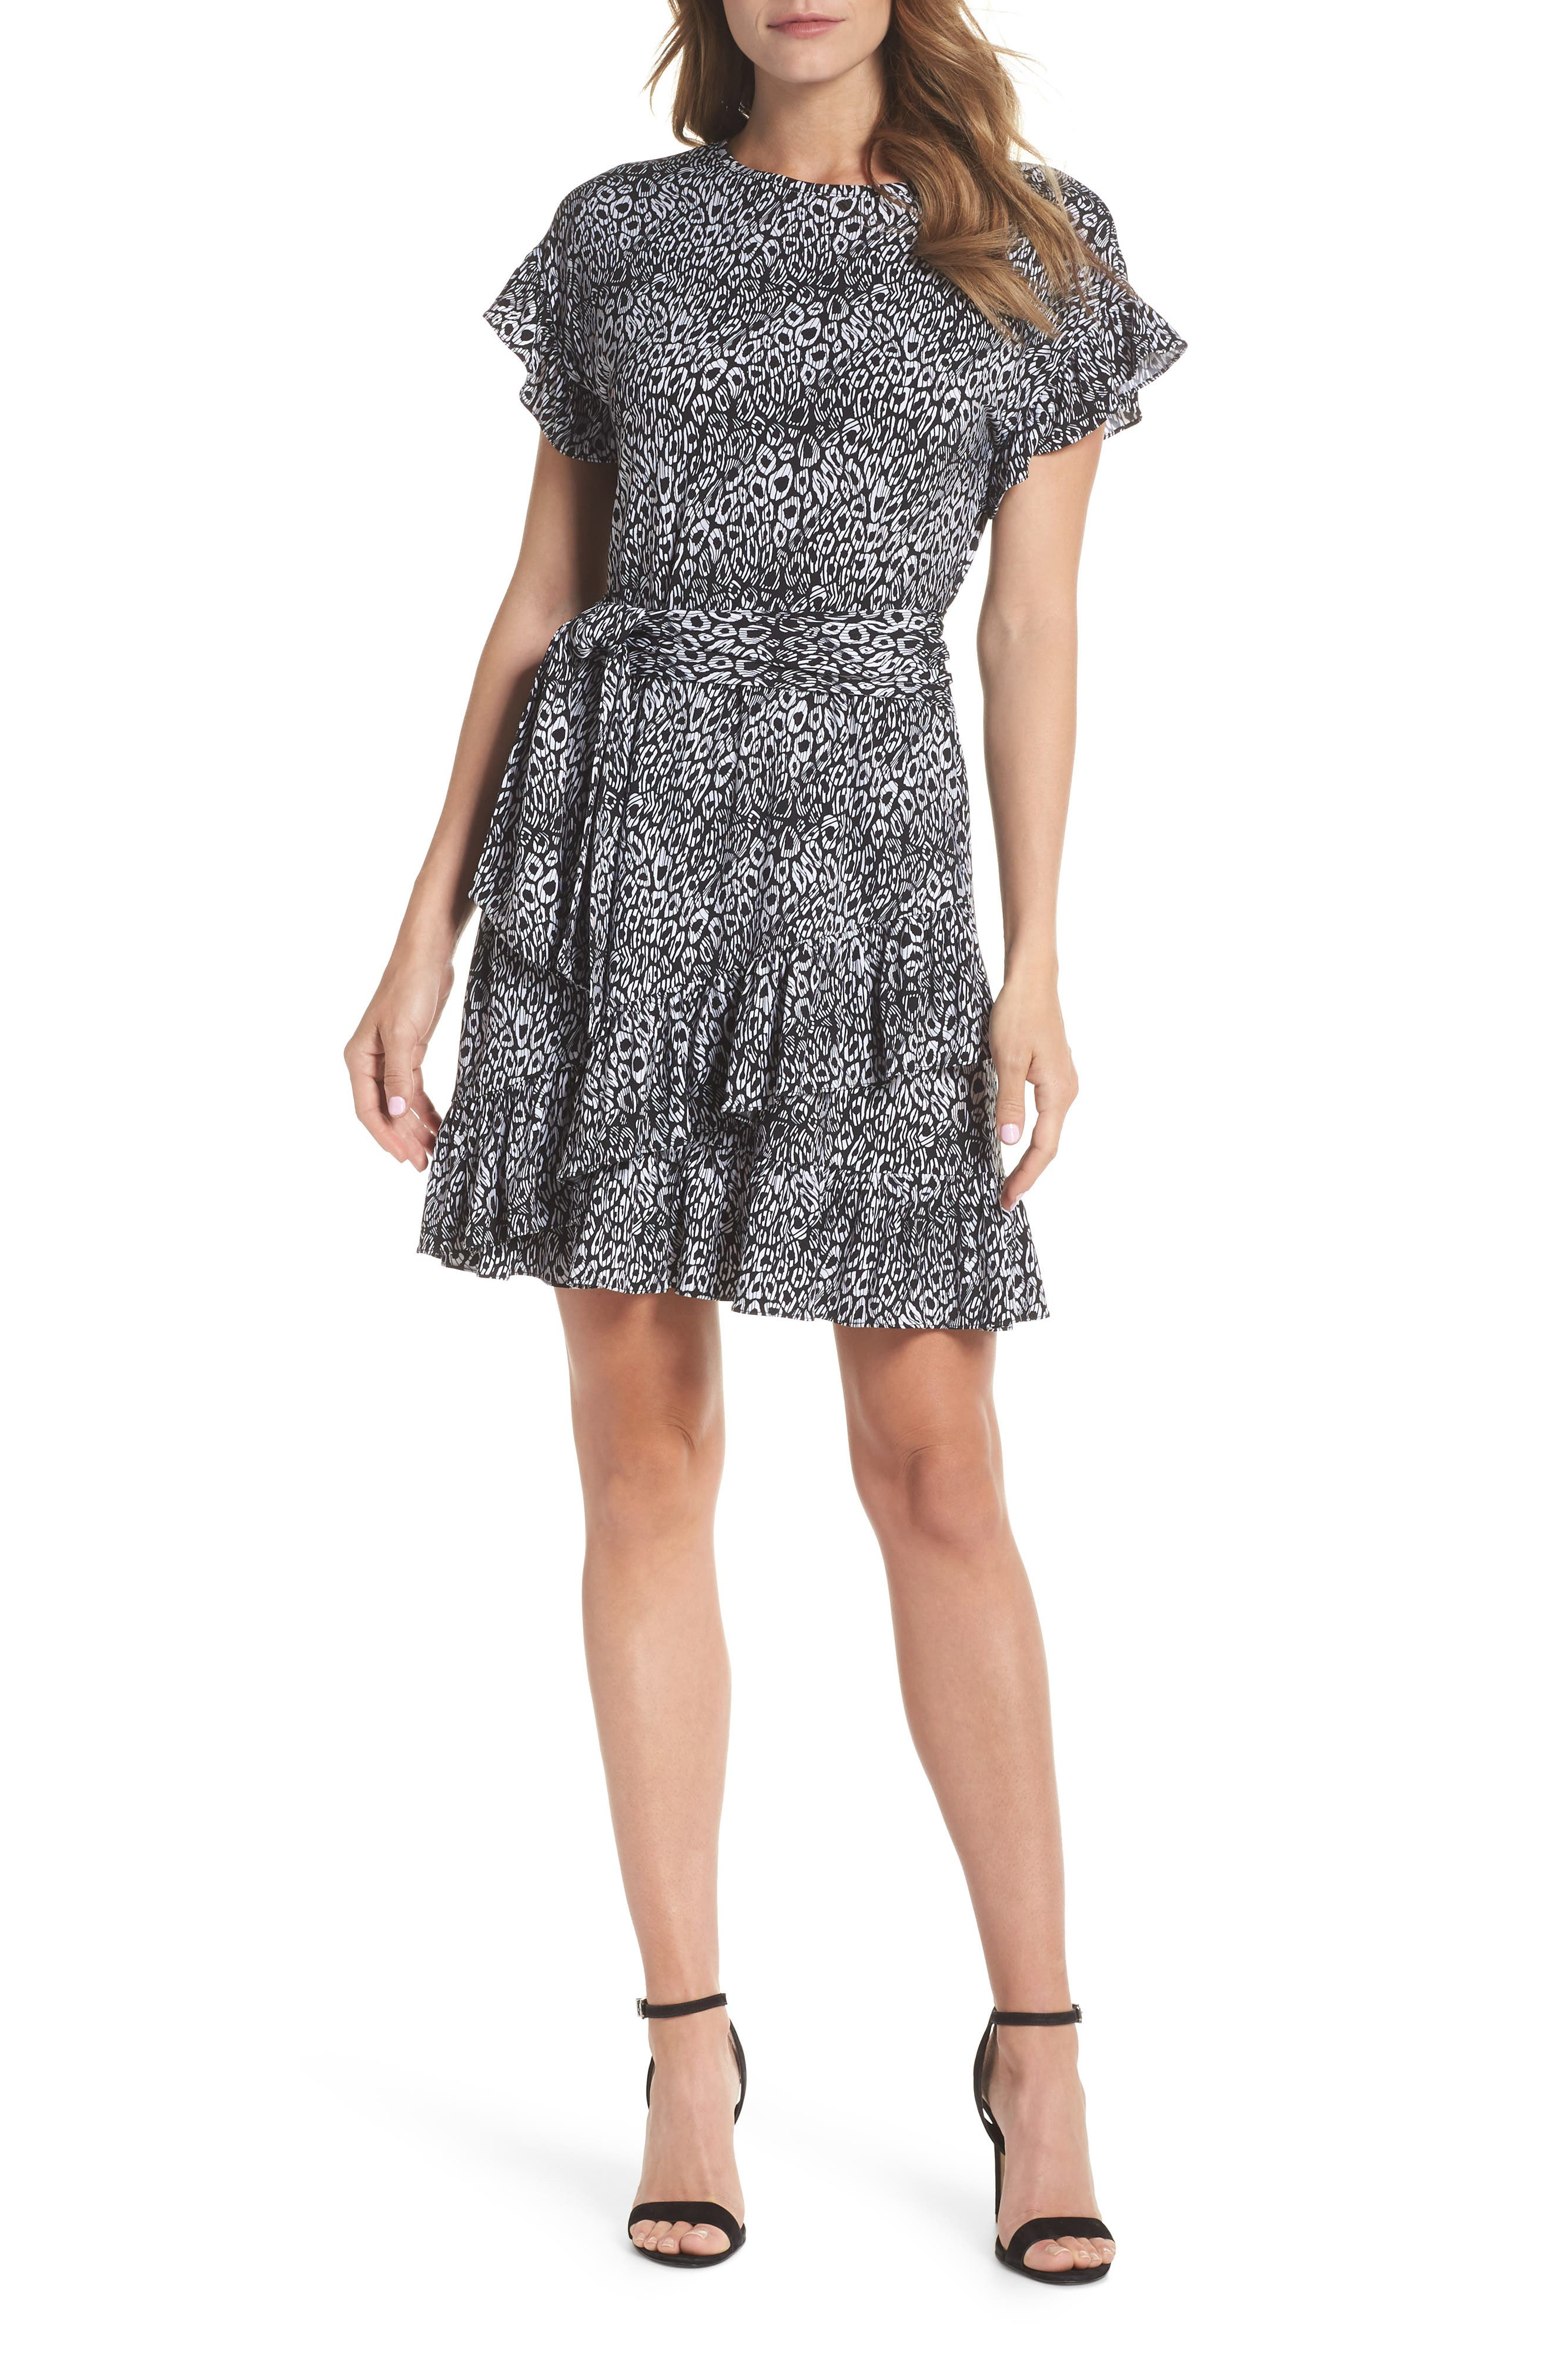 Wavy Leopard Print Ruffle Dress,                         Main,                         color, Black/ White